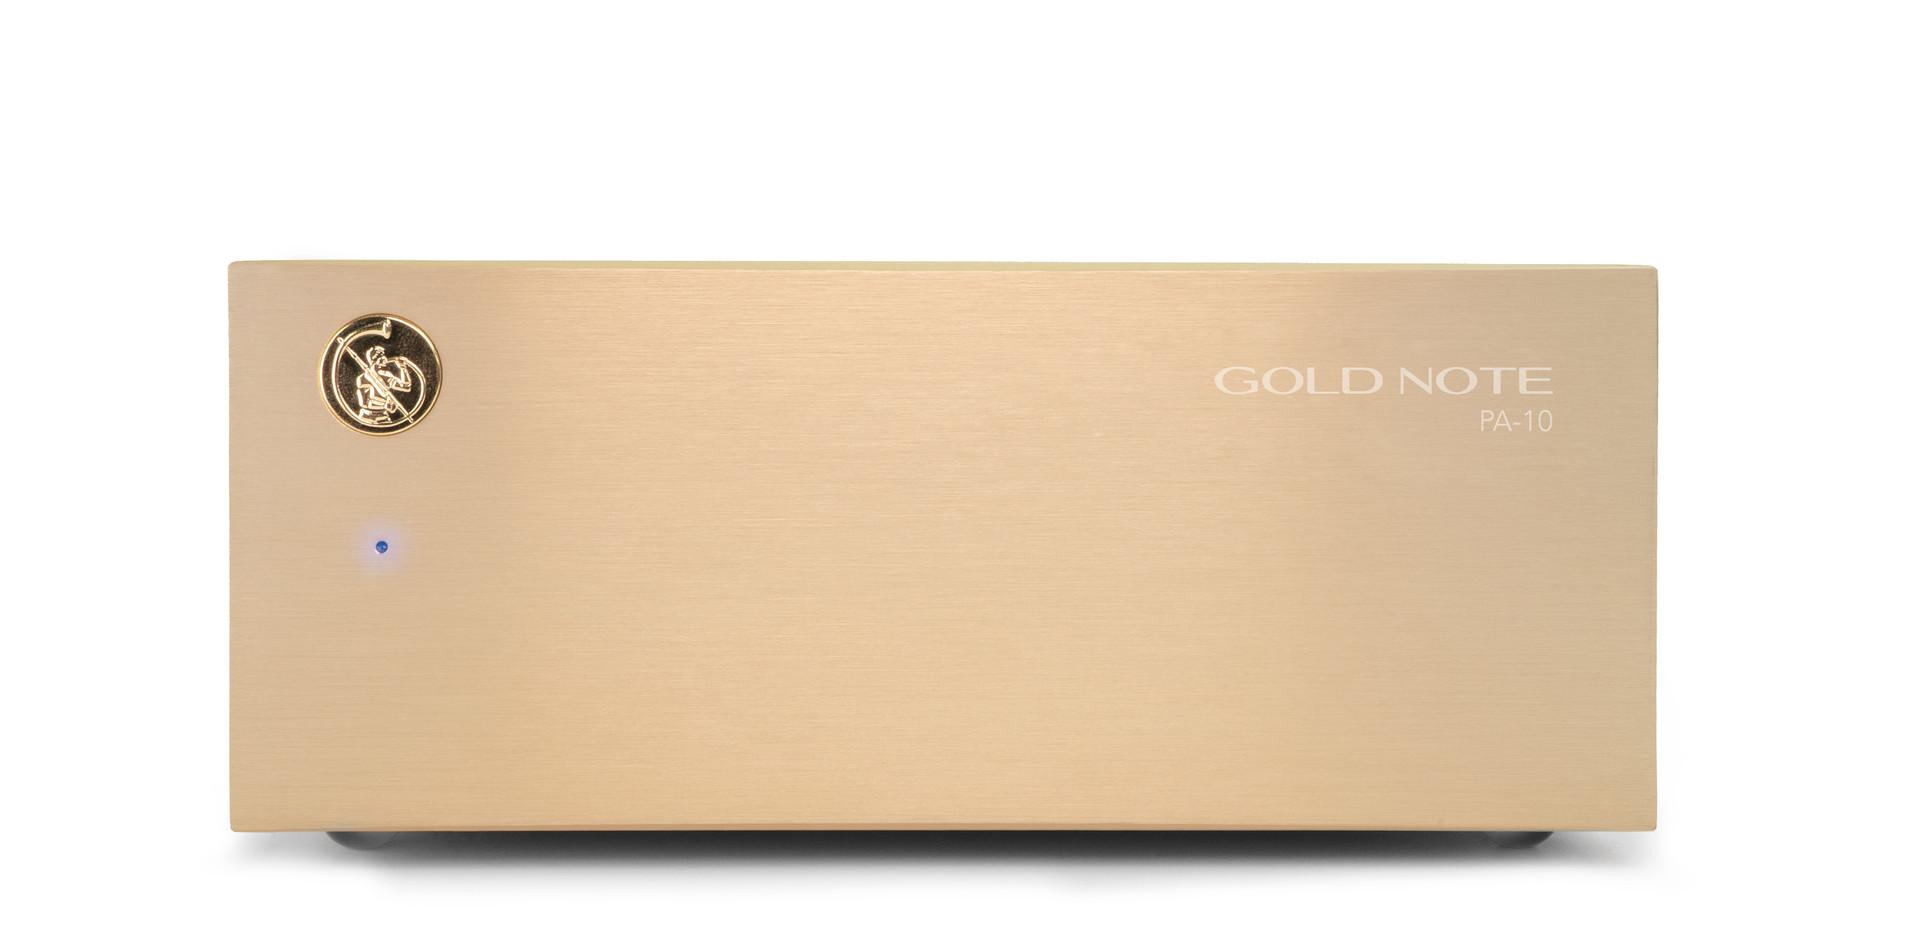 Gold Note PA-10 золотой